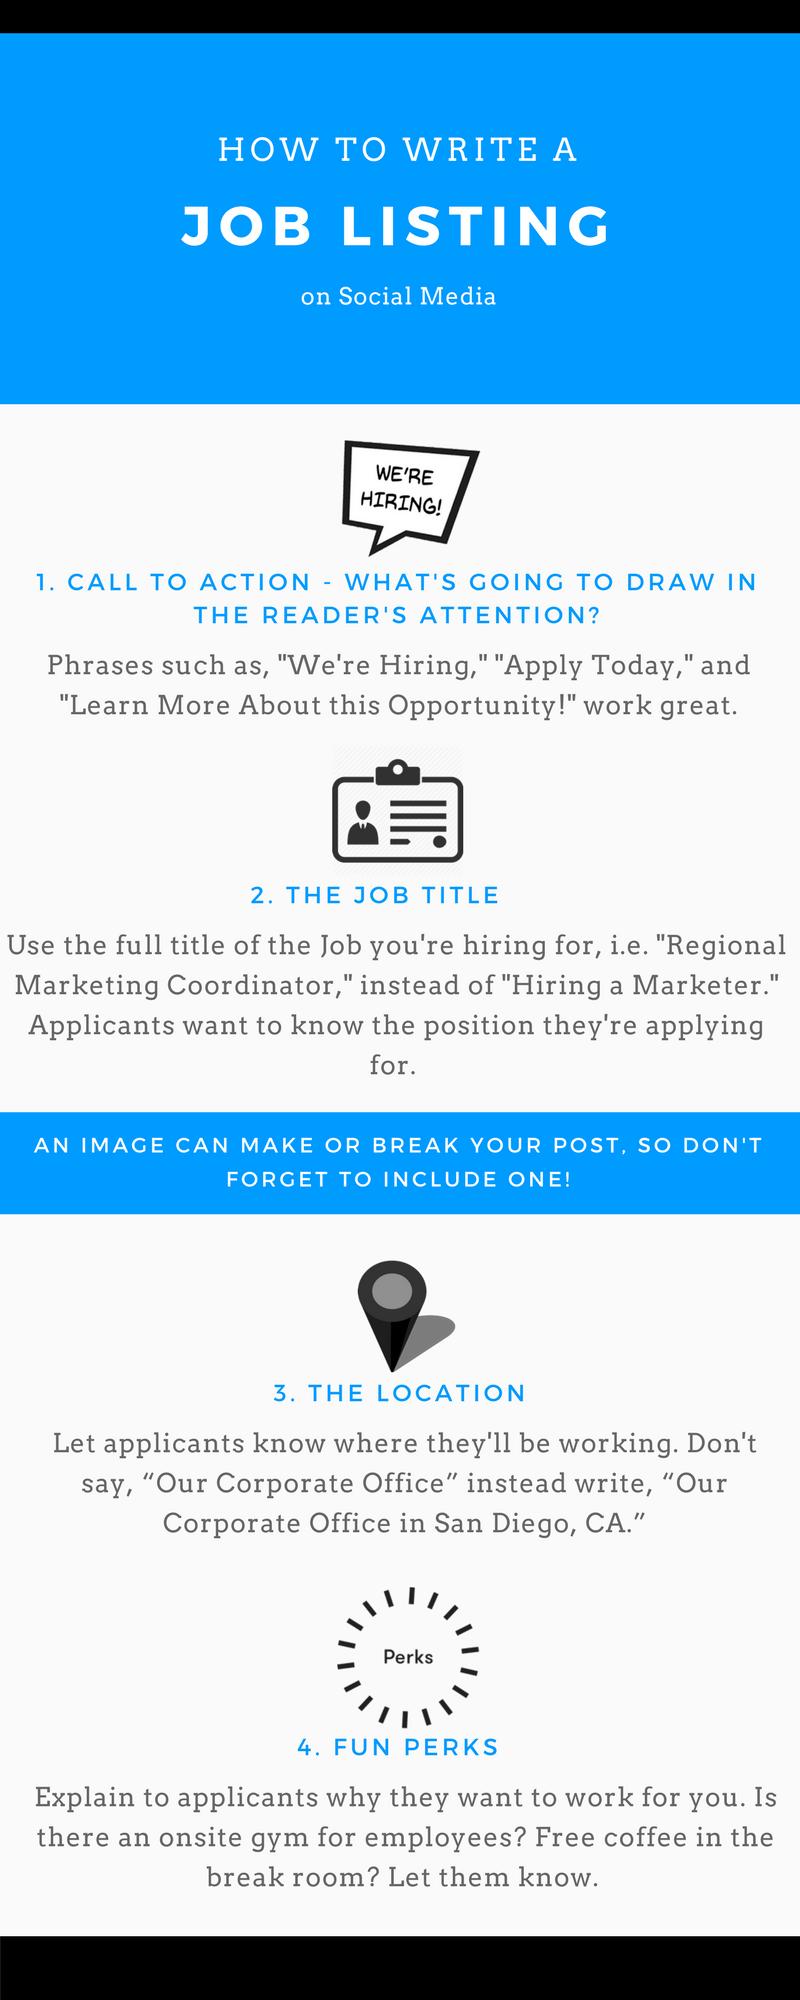 Job Listing Infographic.png